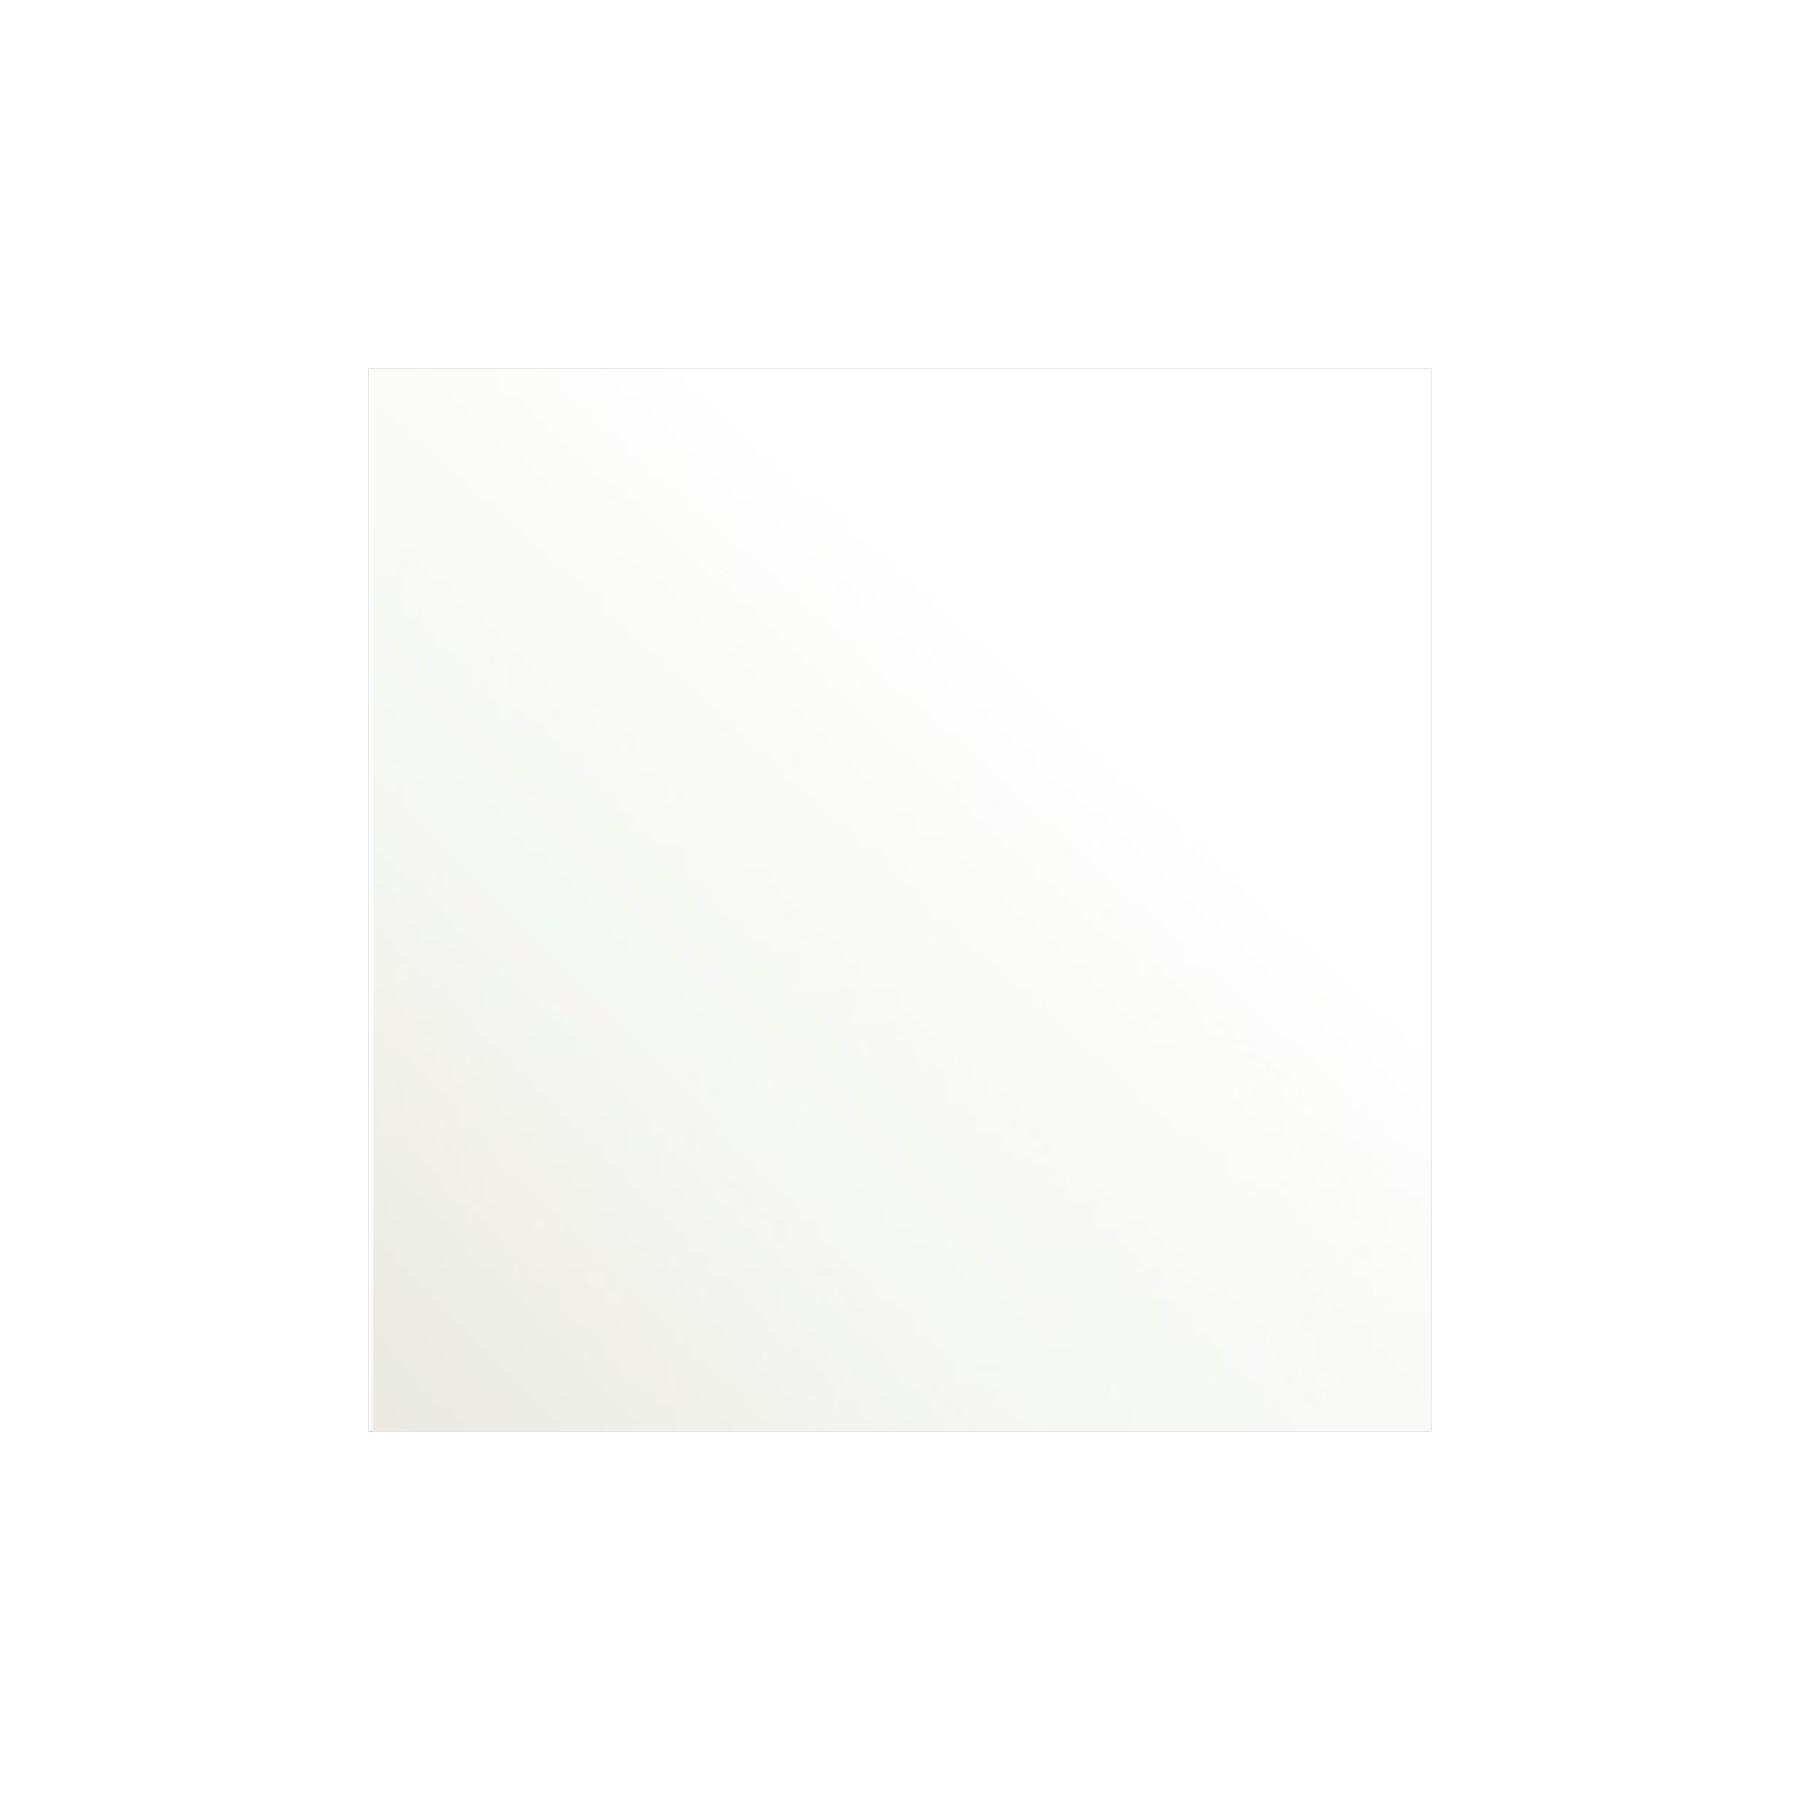 Vinilo textil Easyweed® Electric hoja 30 x 38 cm Blanco ópalo